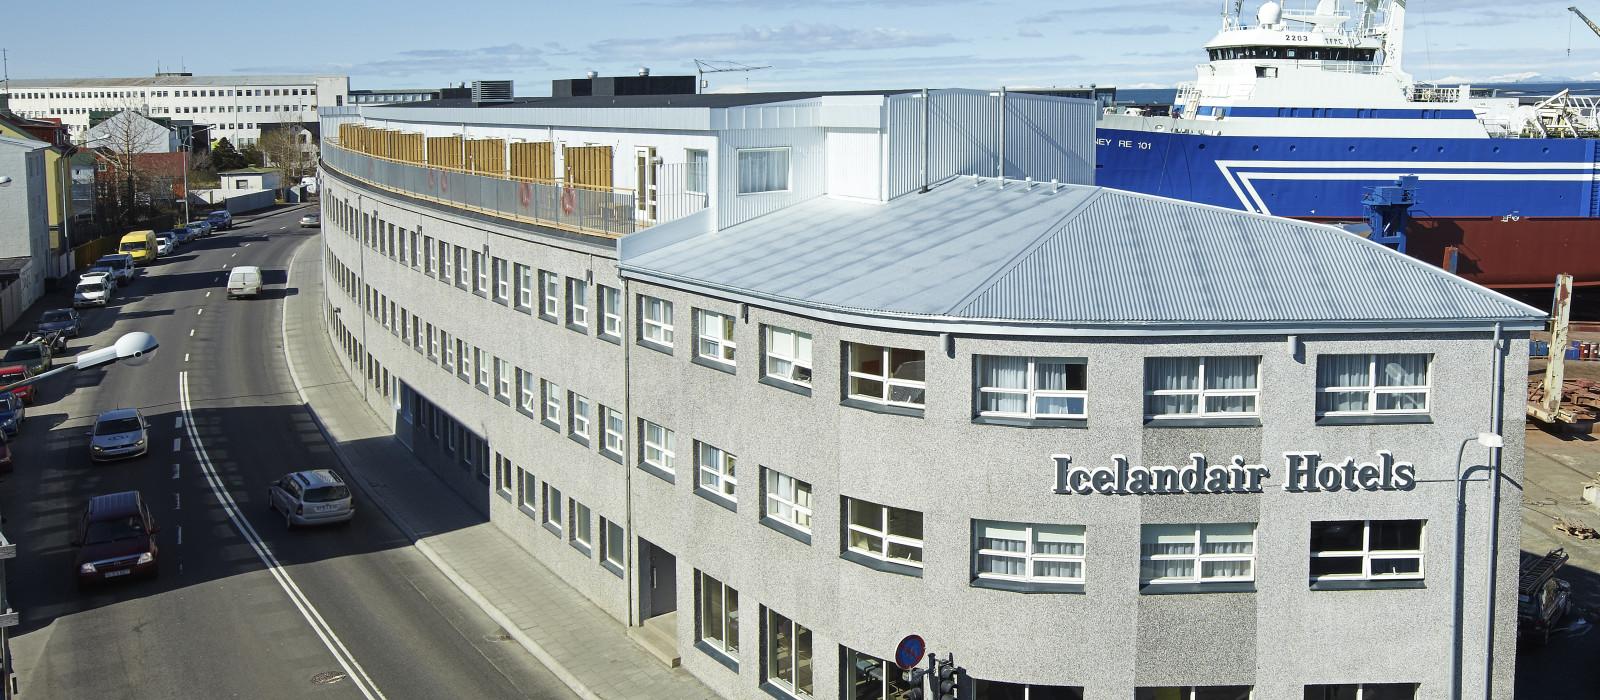 Hotel Icelandair  Reykjavik Marina Island